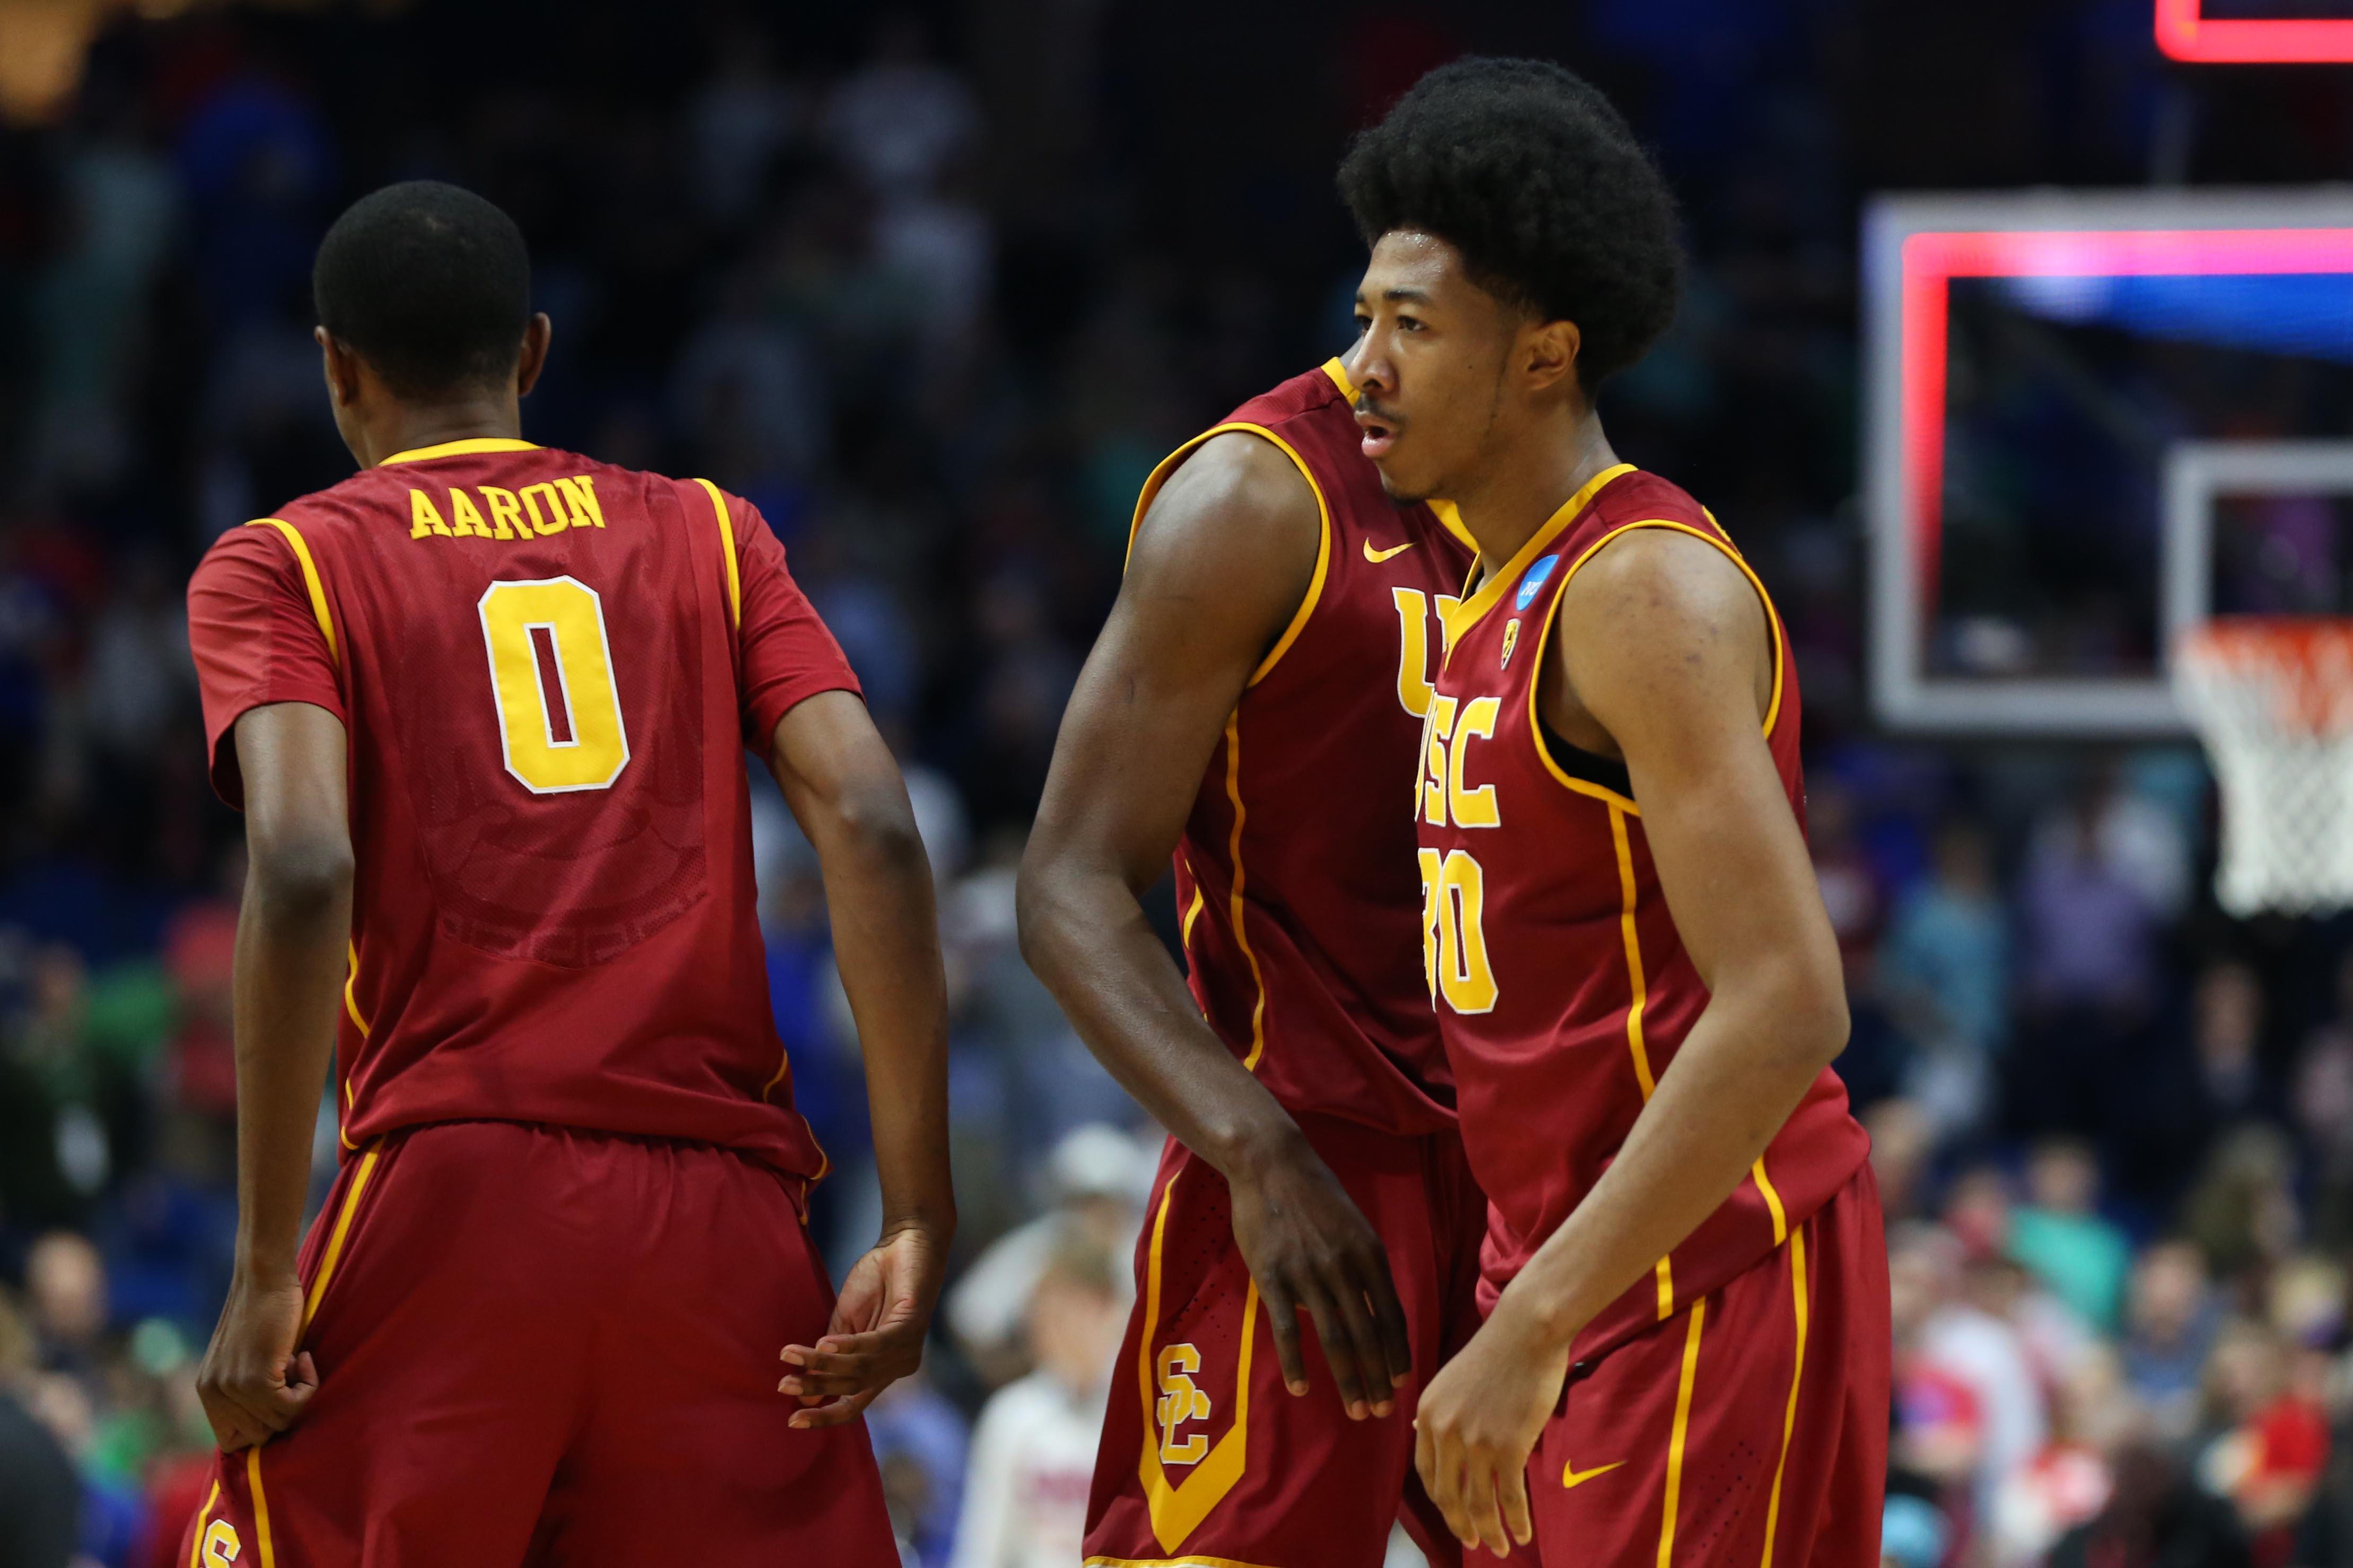 USC Basketball vs. Baylor Odds: Trojans Open as Underdogs